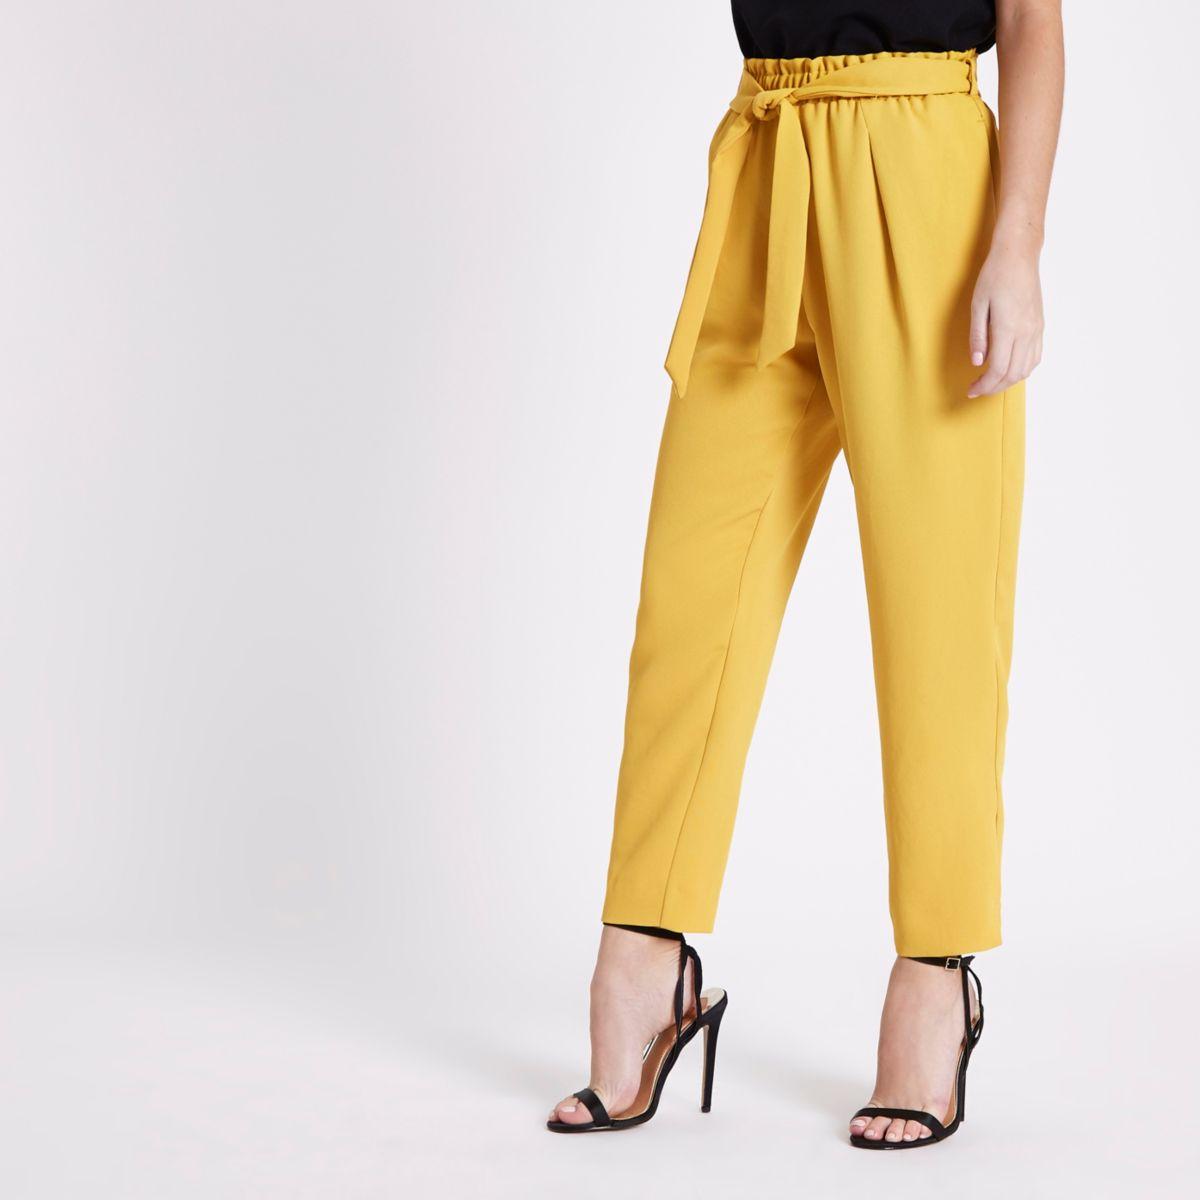 Petite yellow tapered leg trousers